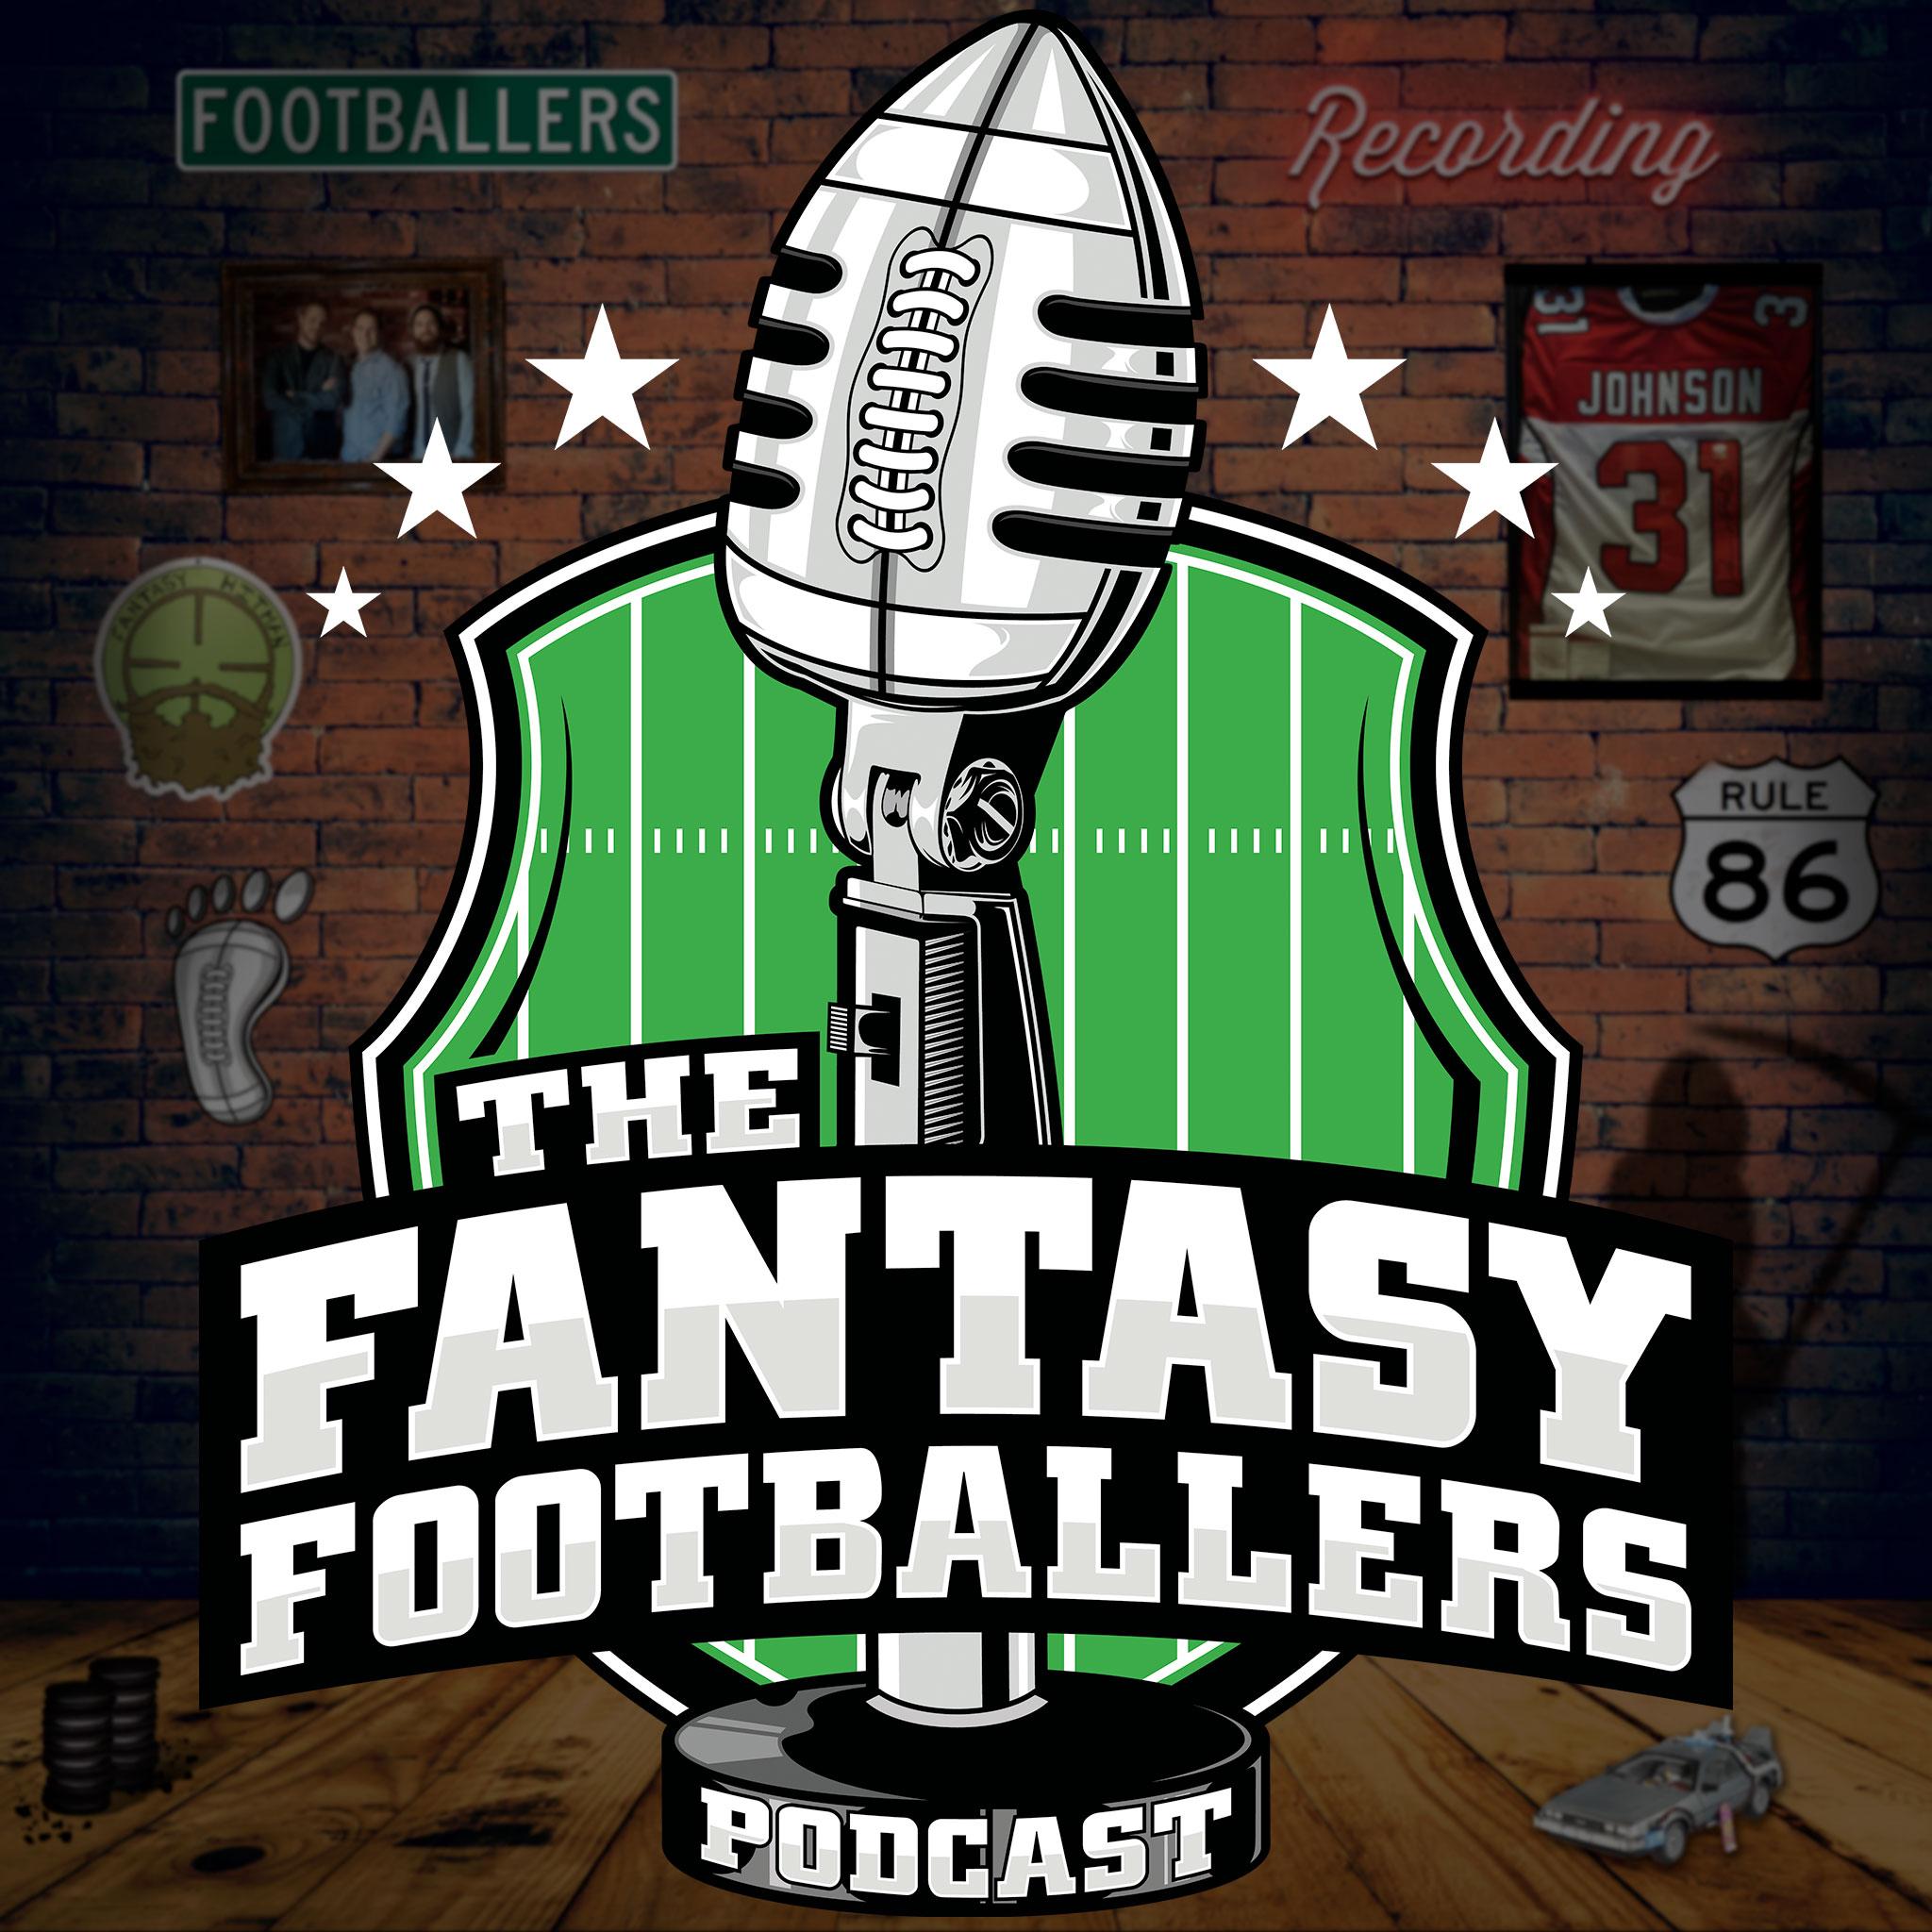 Fantasy Footballers - Fantasy Football Podcast logo